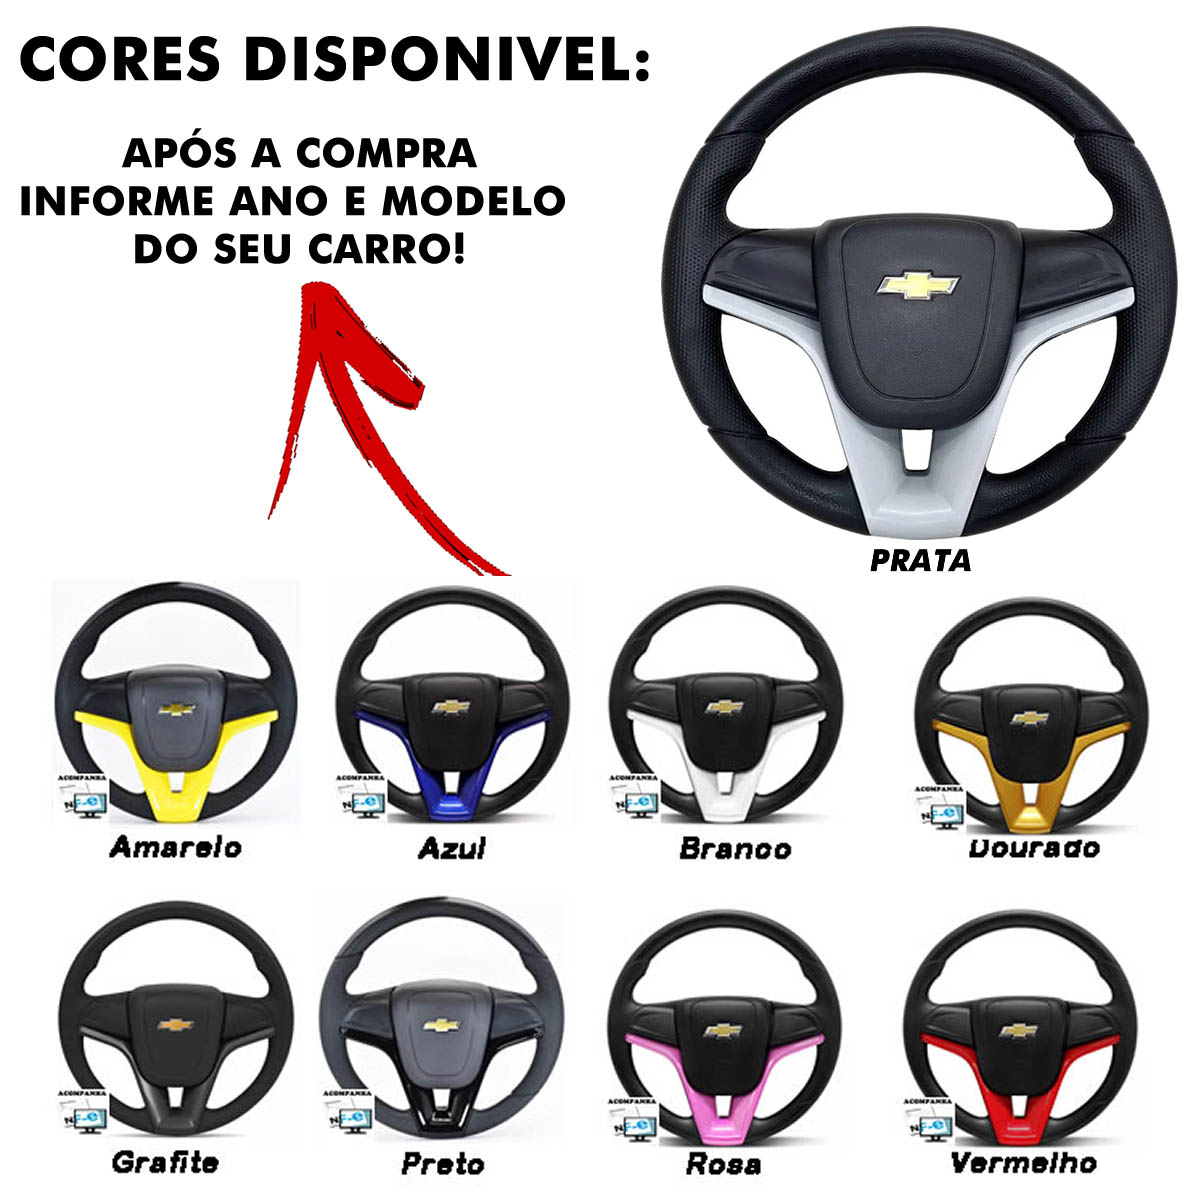 Volante Chevrolet do Cruze Esportivo Cubo Vectra Astra 1993 a 2011 Meriva Zafira 2000 a 2012 Poliparts